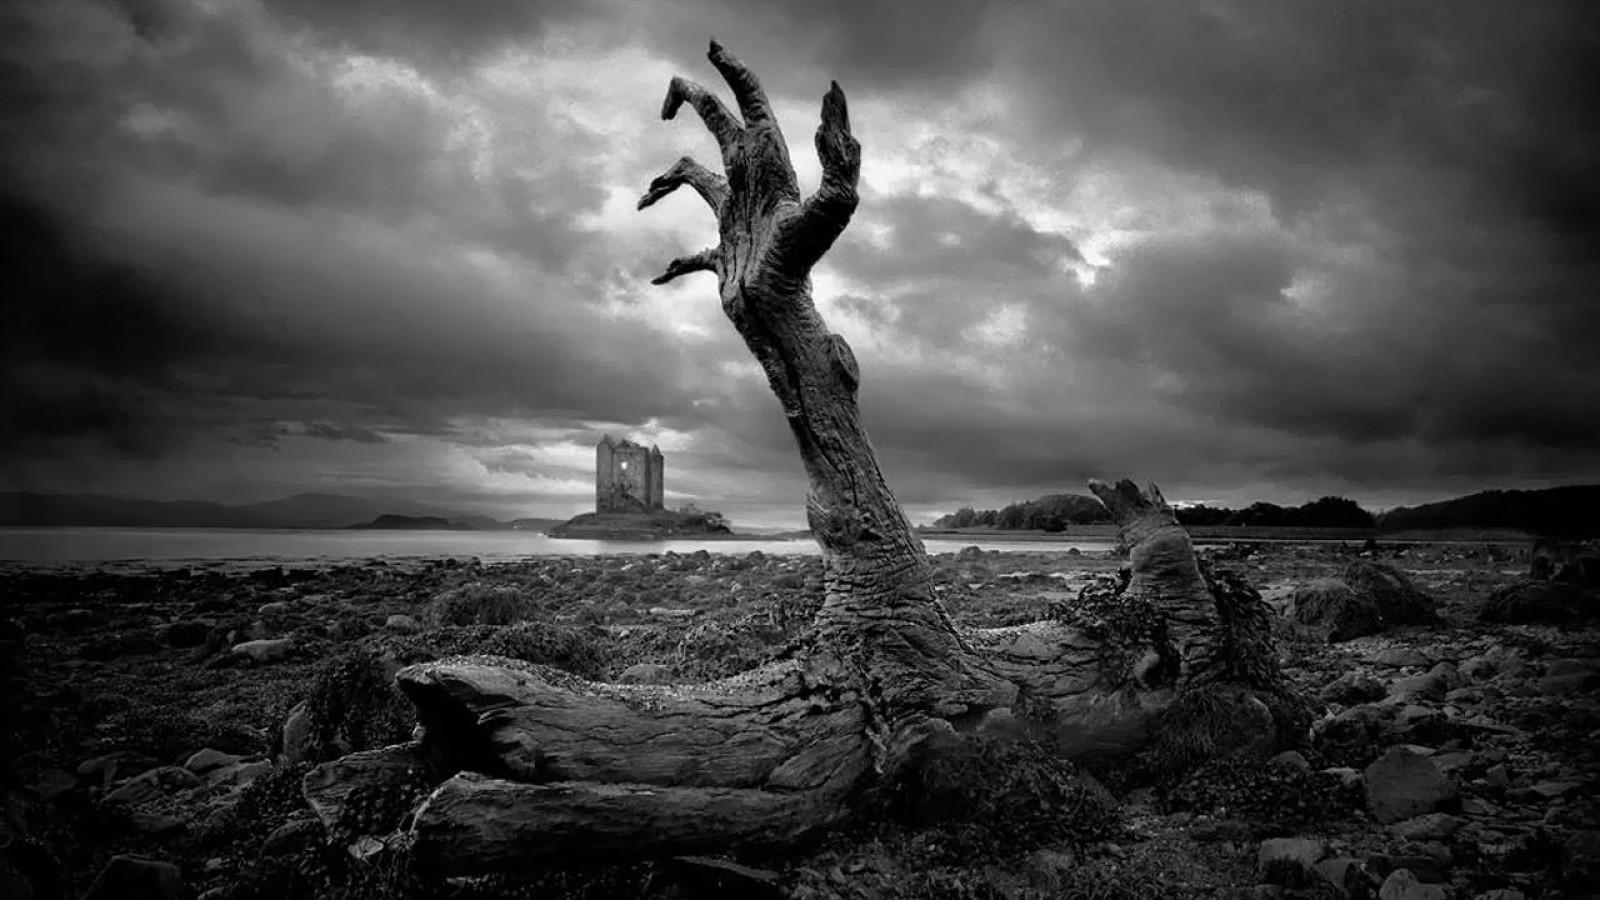 https://get.wallhere.com/photo/sunlight-black-monochrome-rock-nature-ruin-sky-photography-statue-monument-light-cloud-tree-photograph-darkness-black-and-white-monochrome-photography-woody-plant-194089.jpg